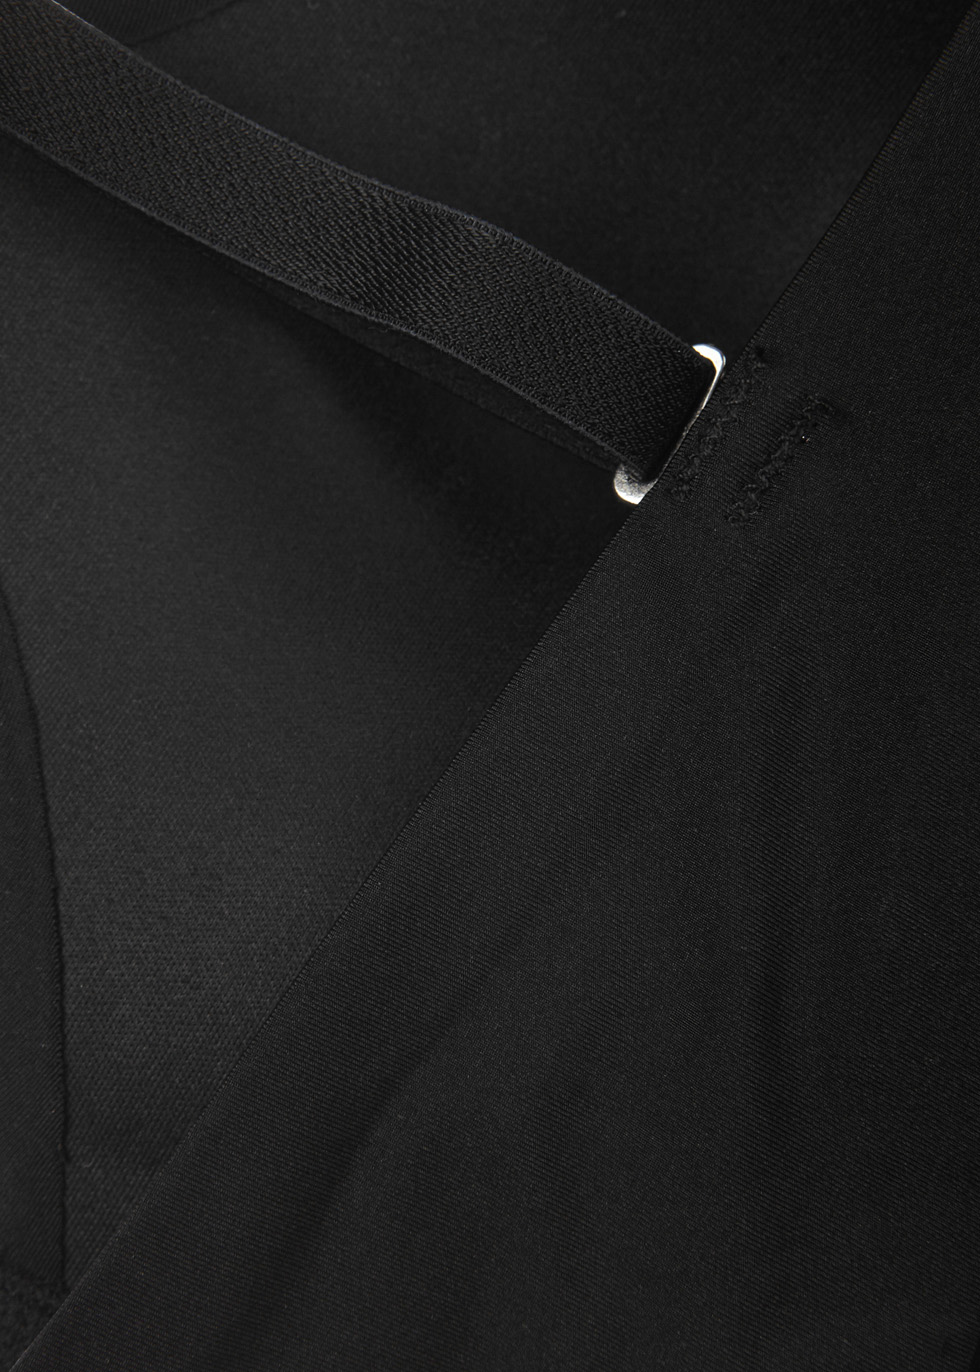 Intuition black push-up bra - Wacoal